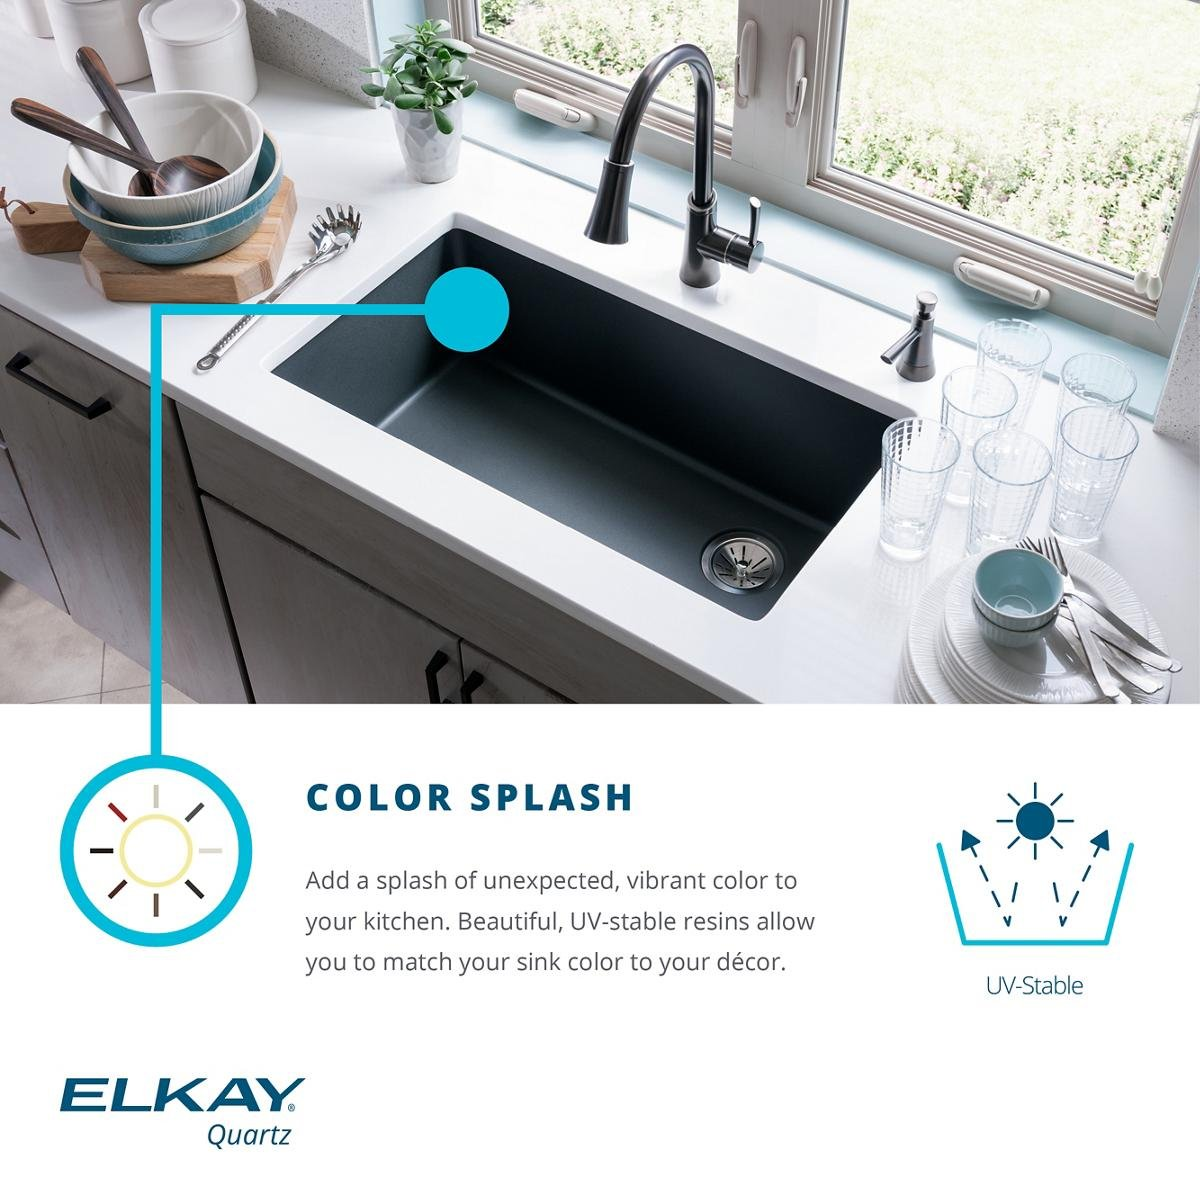 Elkay Quartz Classic ELGU2522WH0 Single Bowl Undermount Sink, White by Elkay (Image #4)